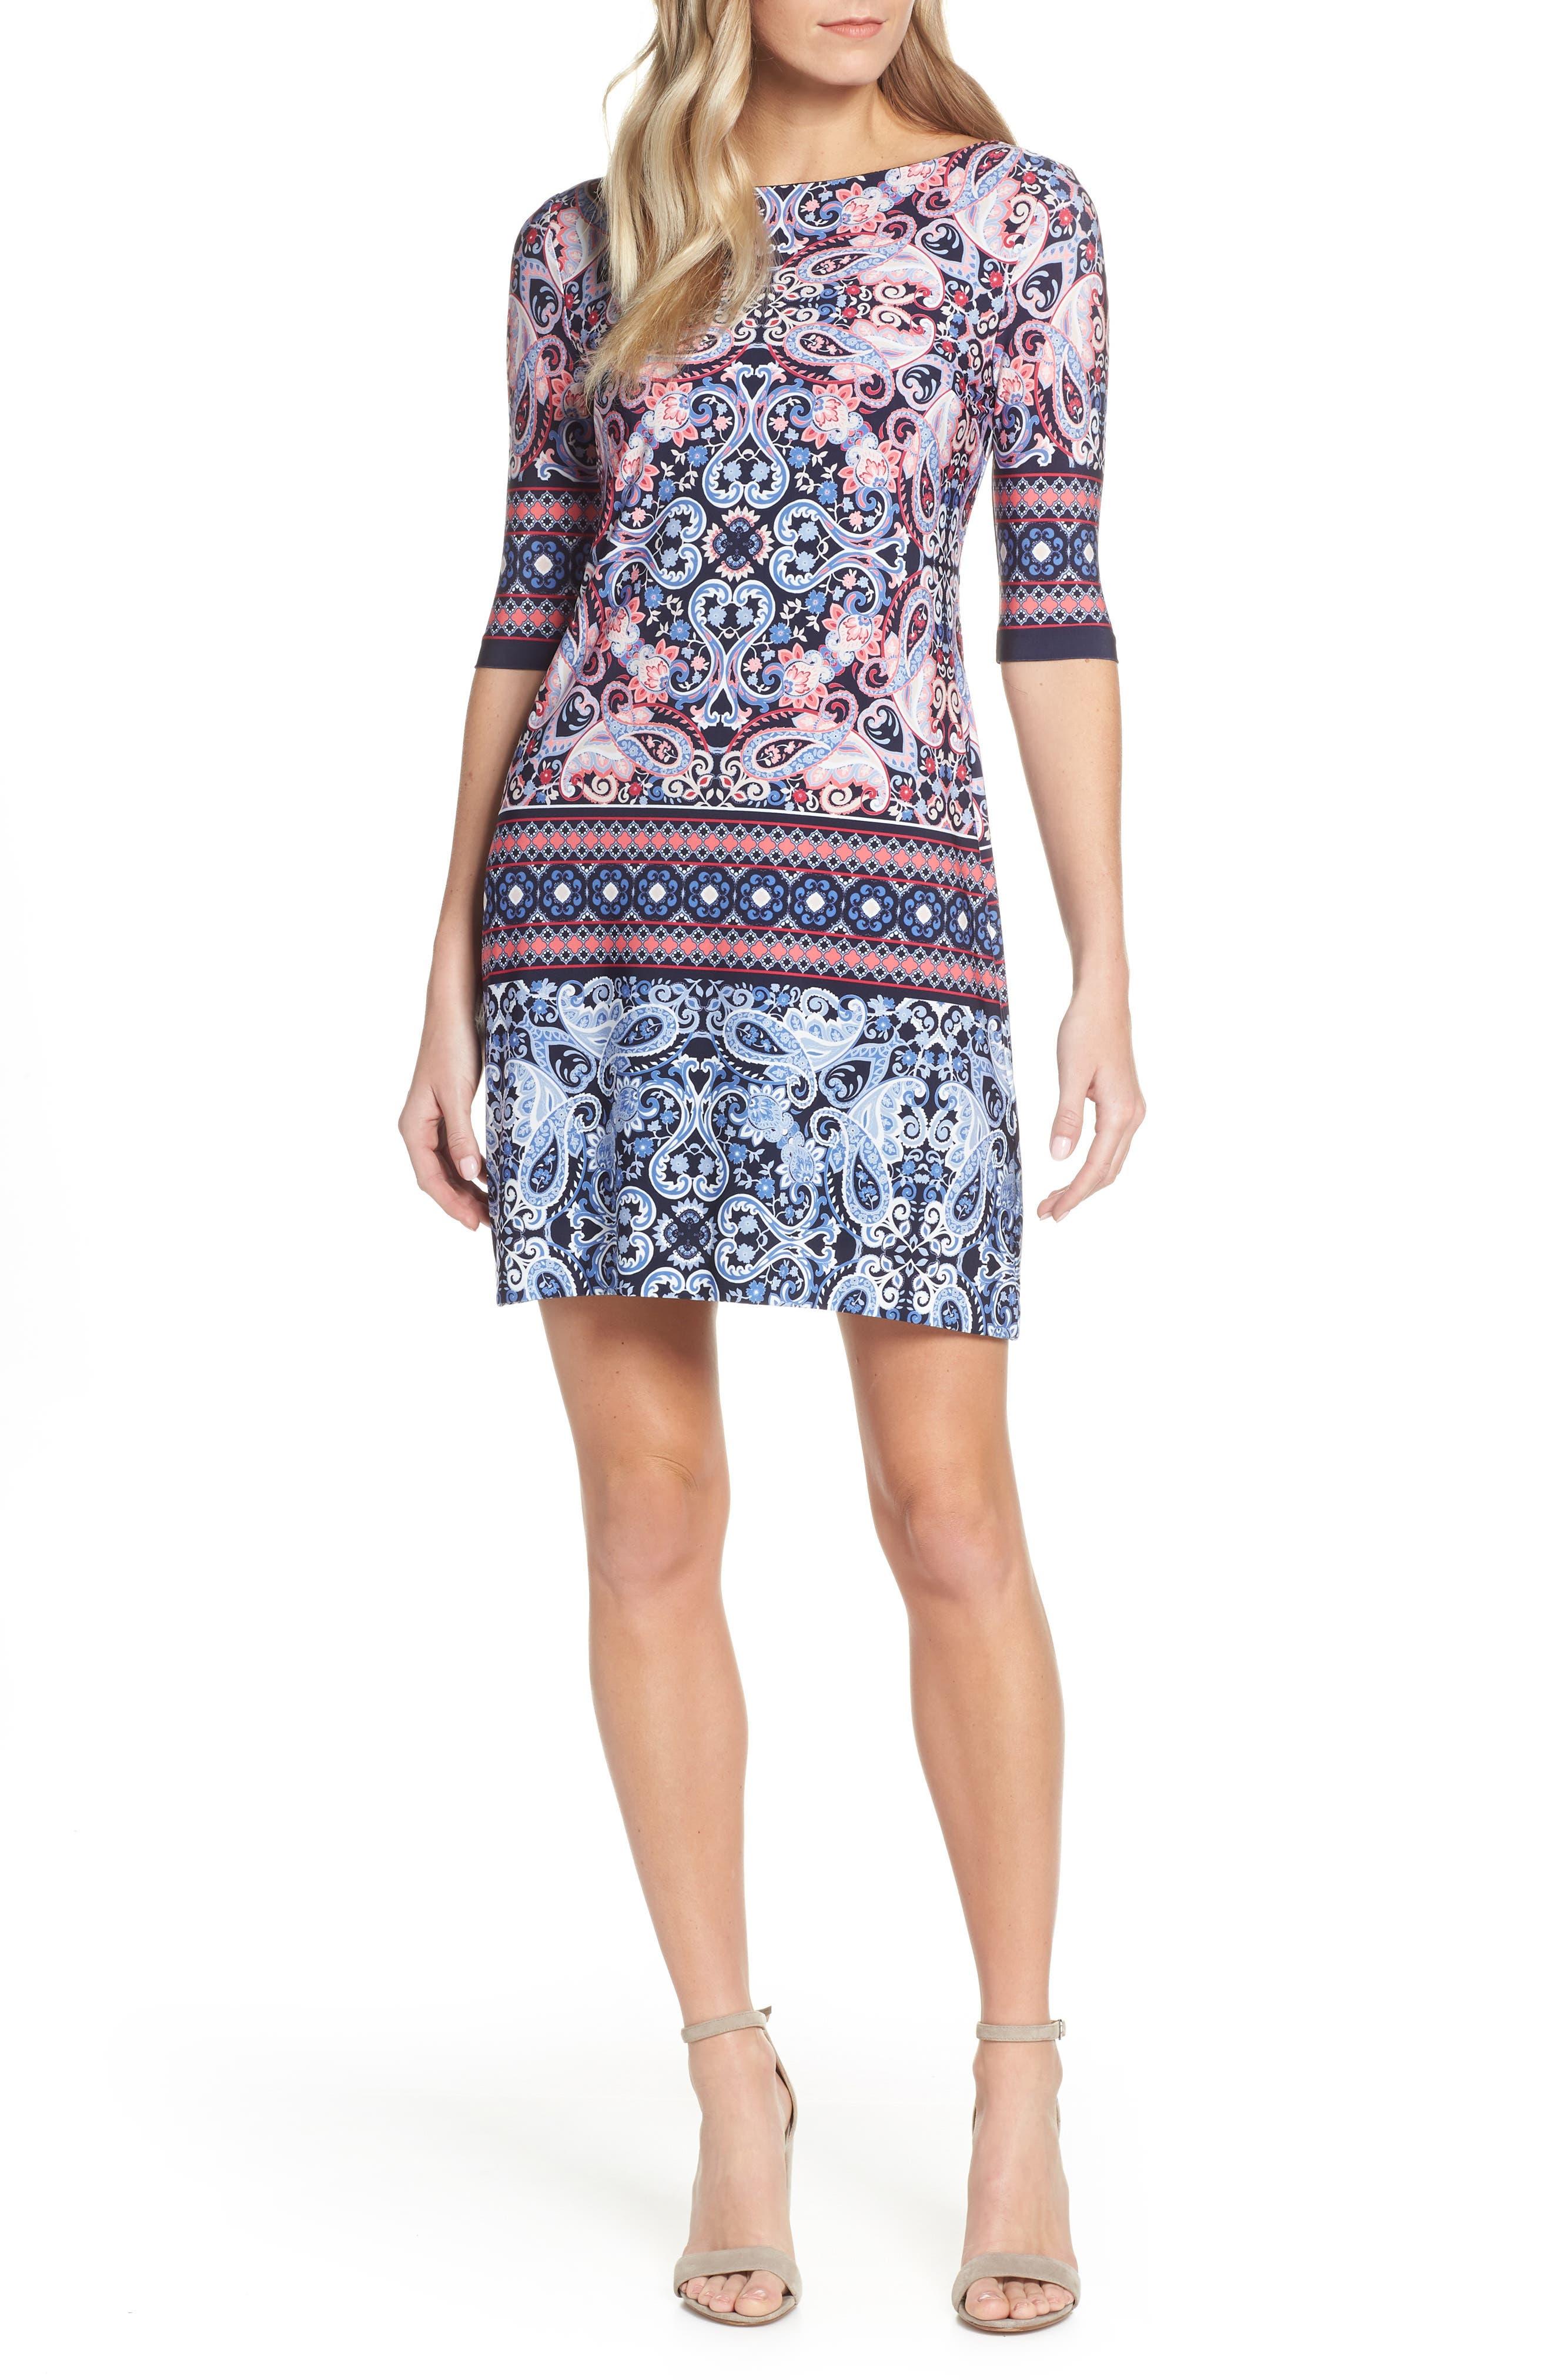 ELIZA J Paisley Shift Dress, Main, color, NAVY